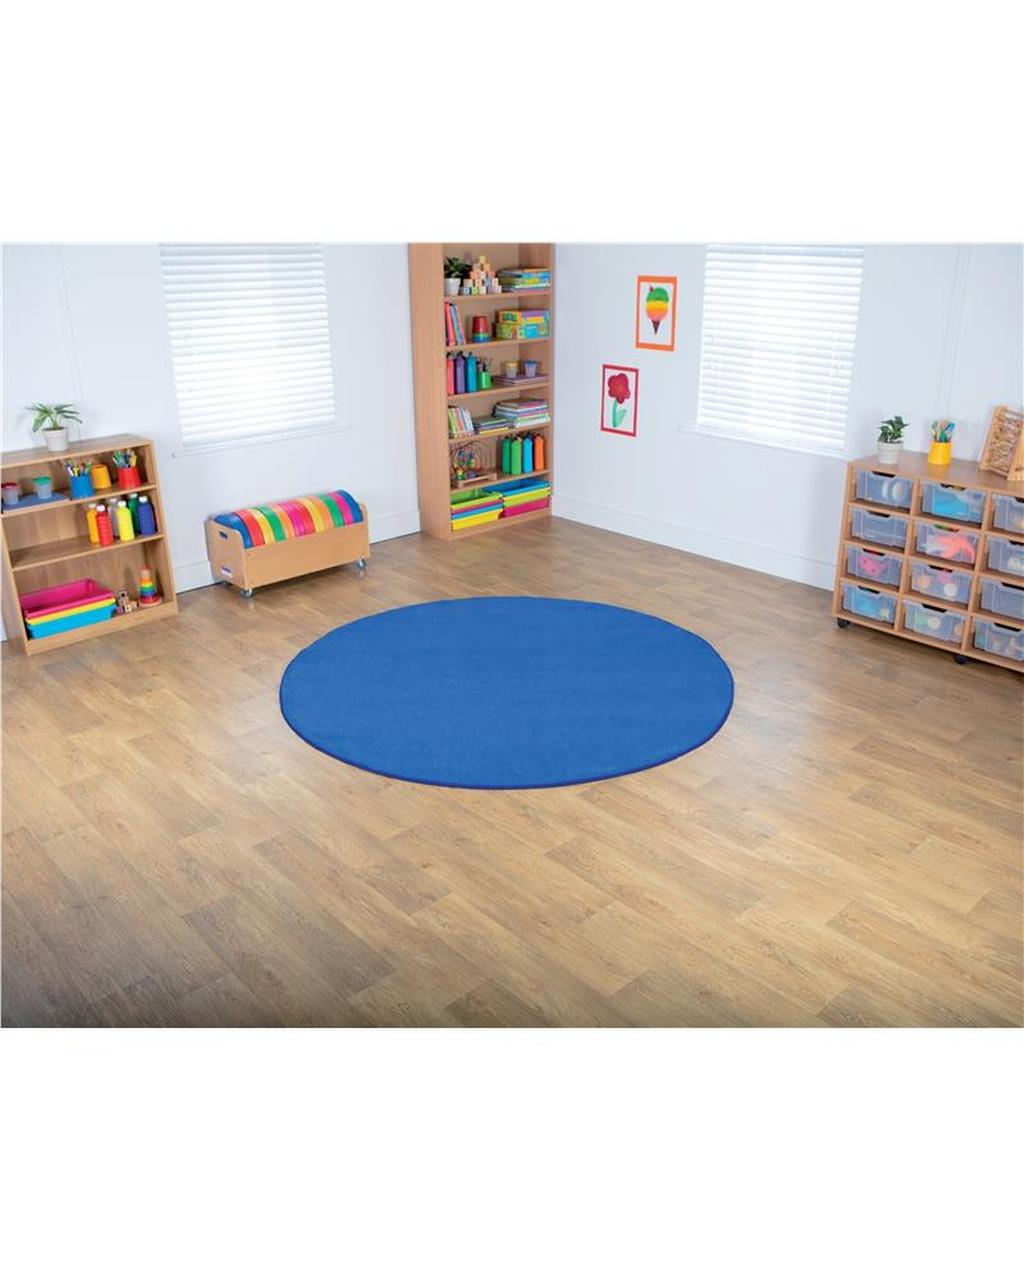 Blue Circular Carpet